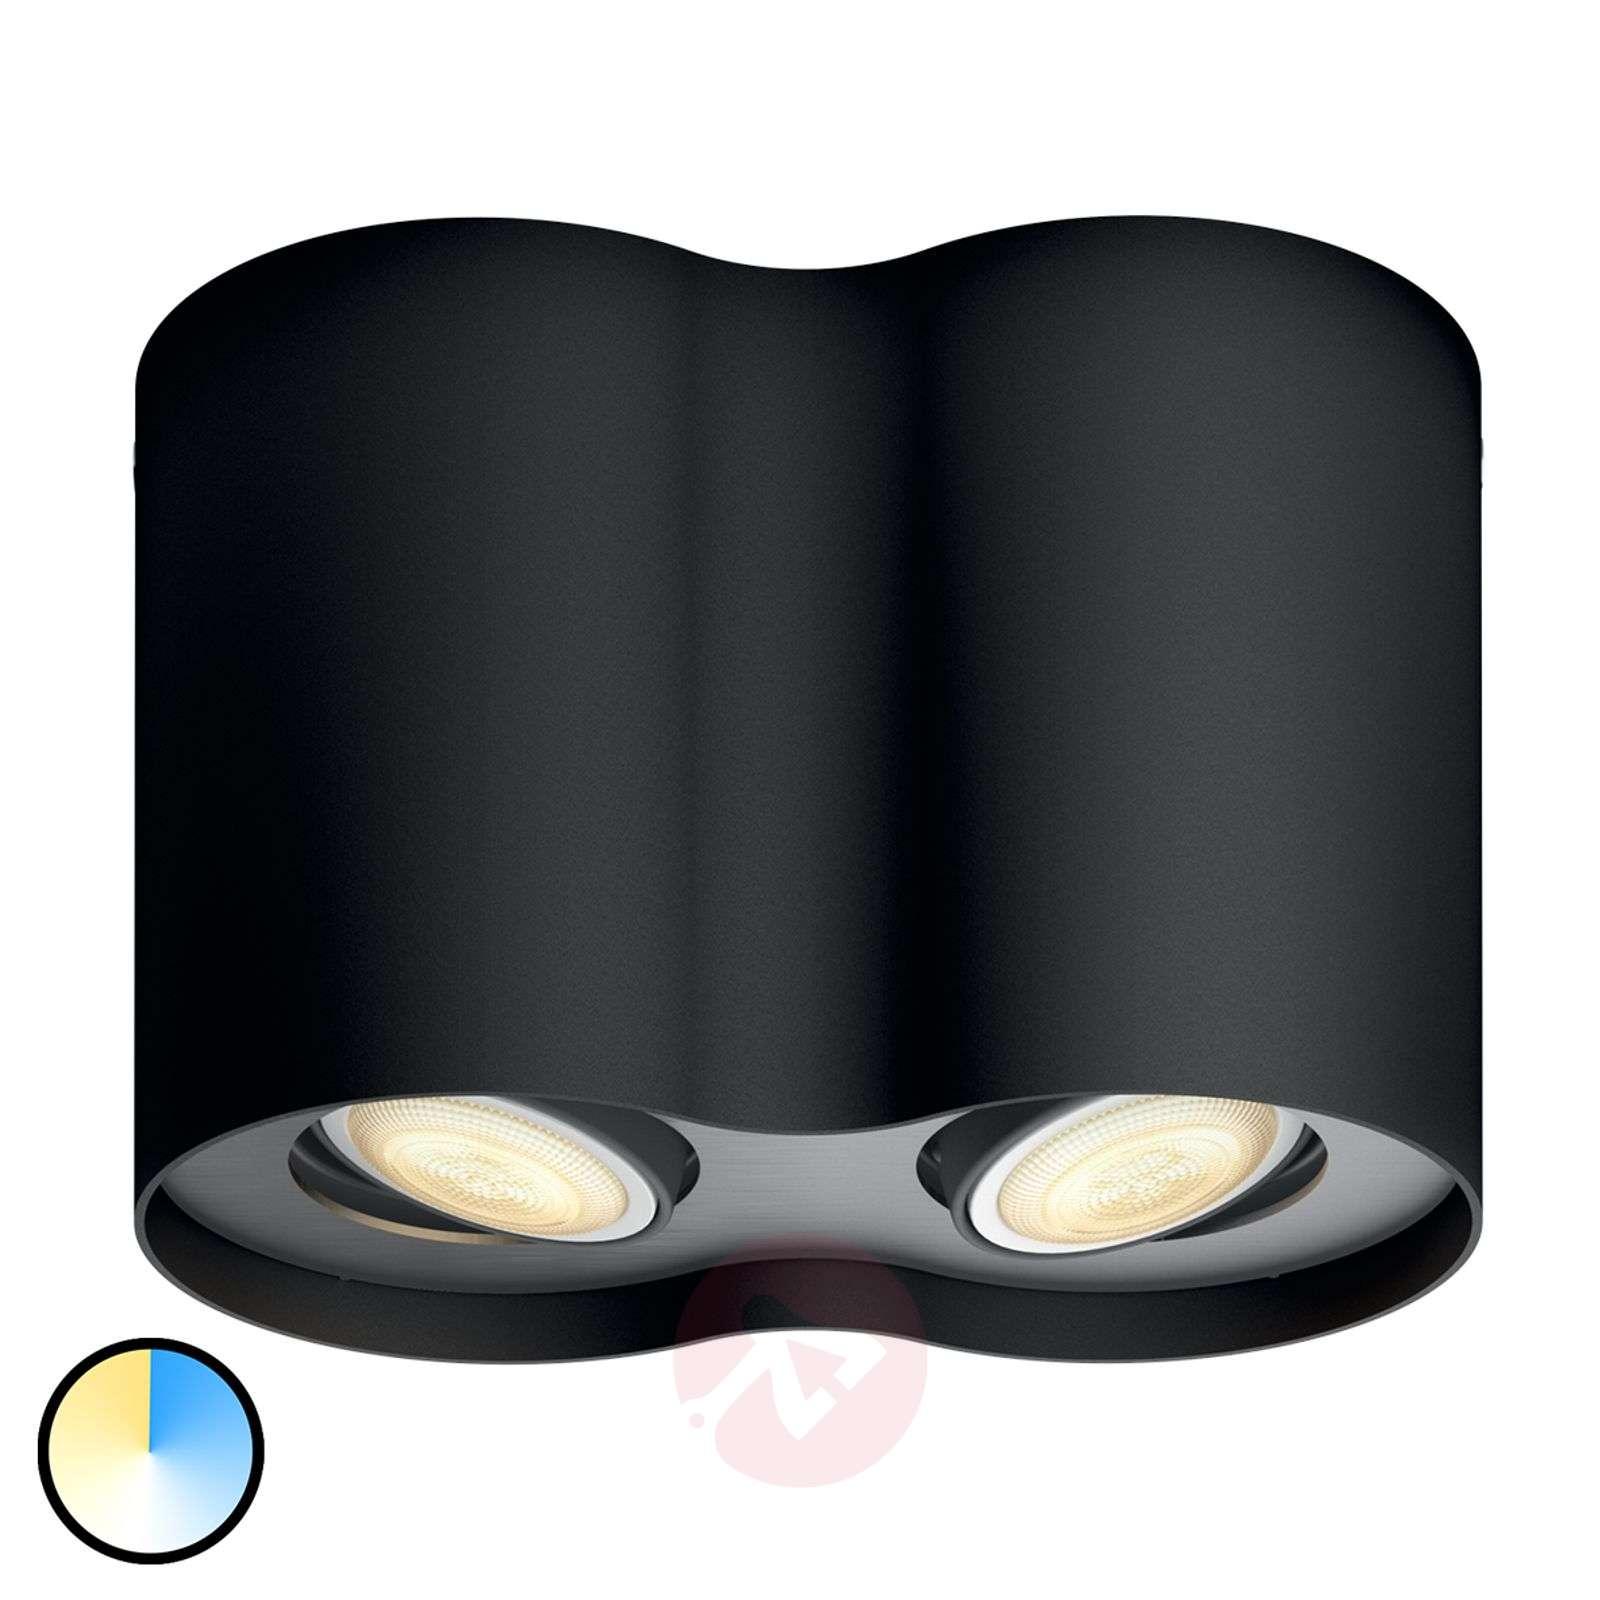 Philips Hue Led Spotlight Pillar 2 Bulb Lights Ie